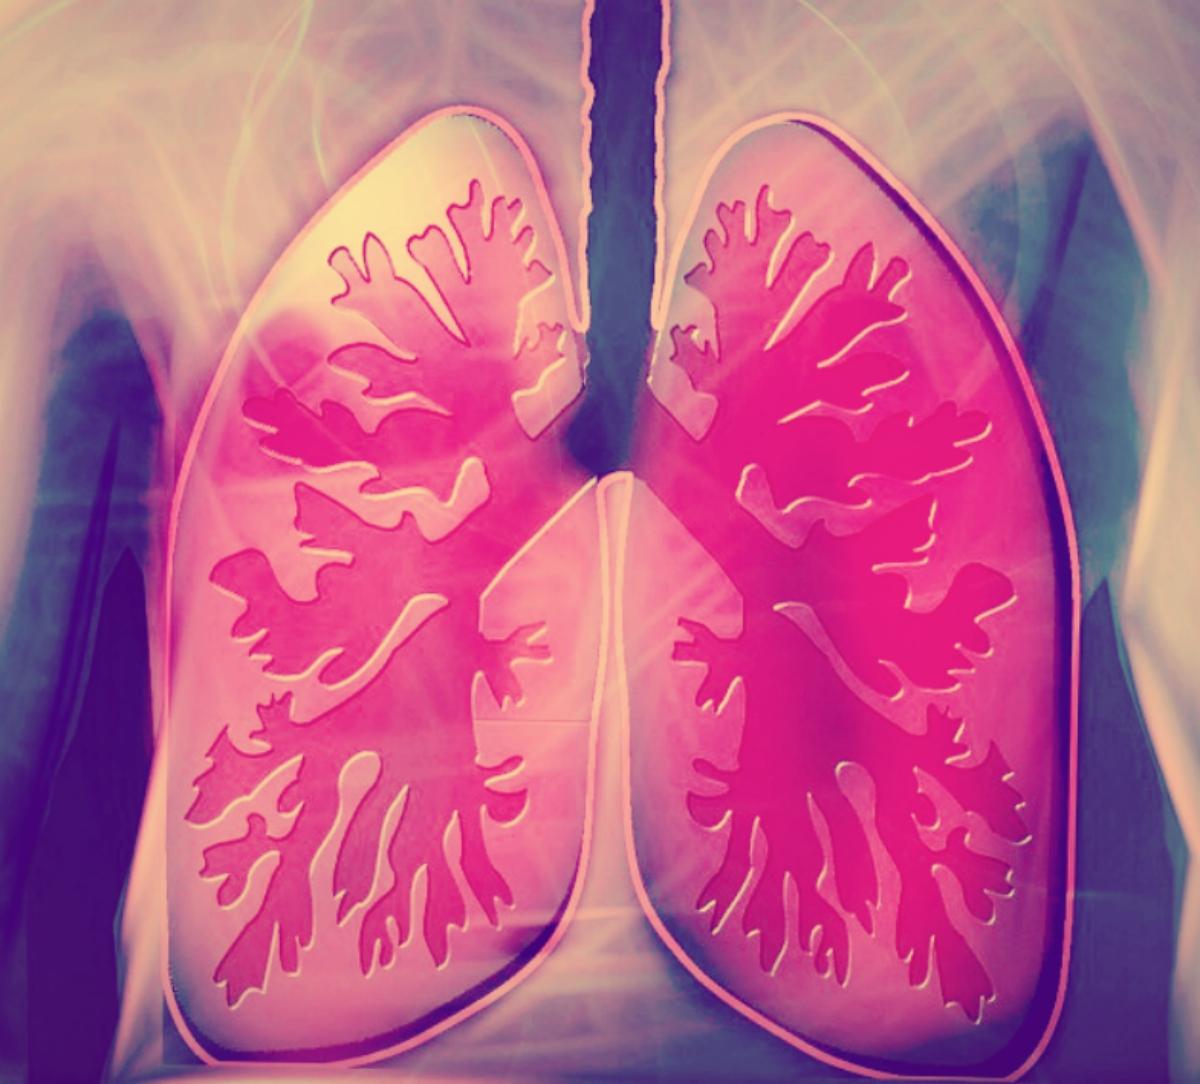 Lung illustration, credit: public domain